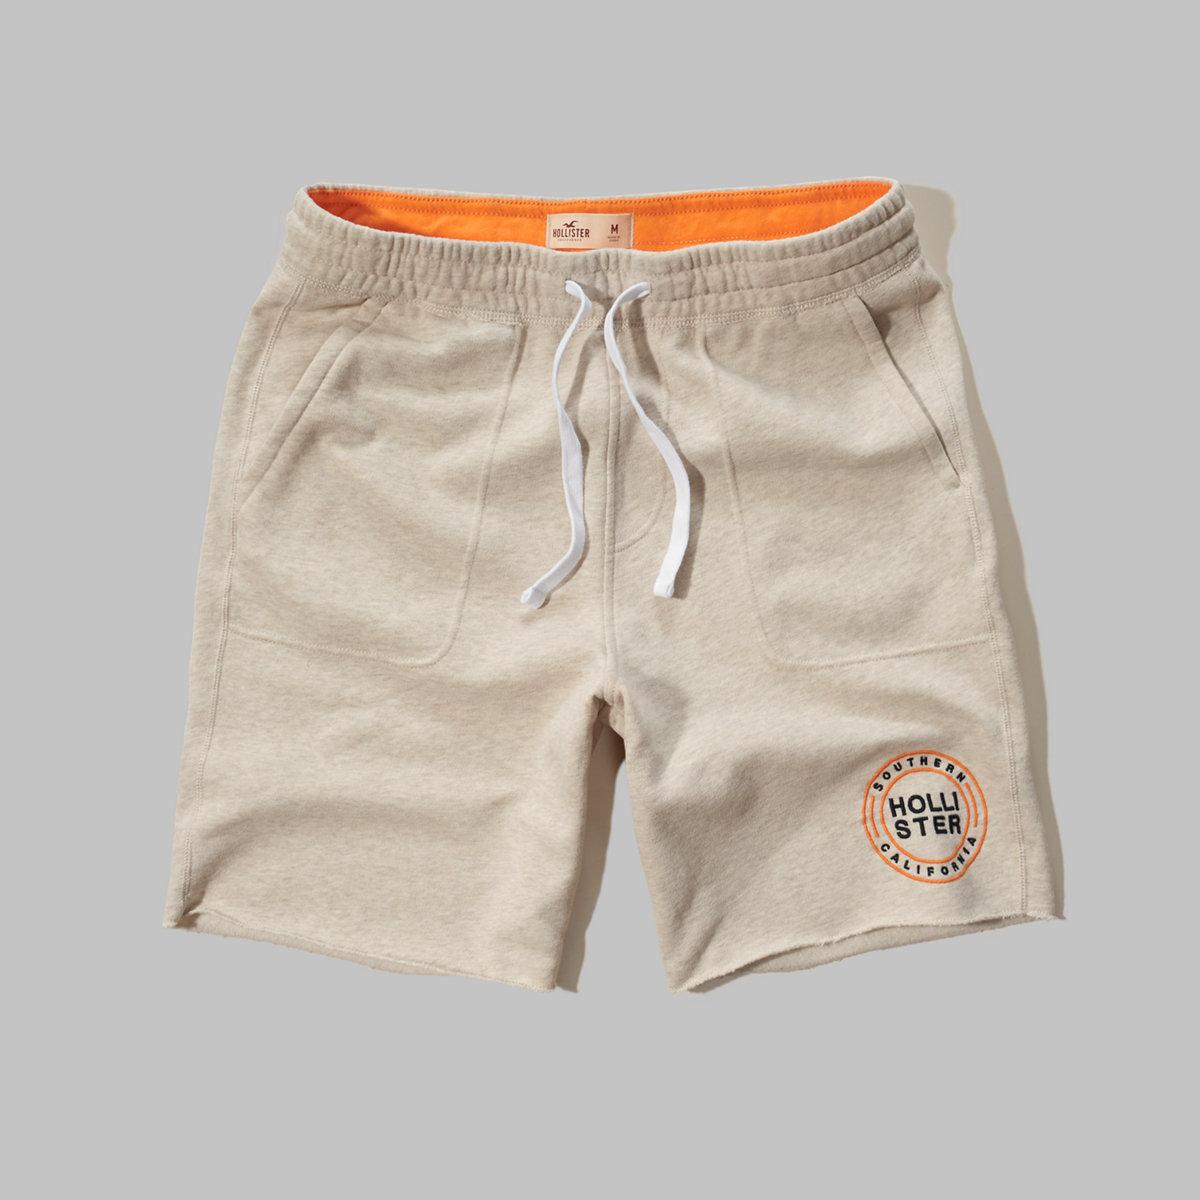 Hollister Graphic Fleece Jogger Shorts